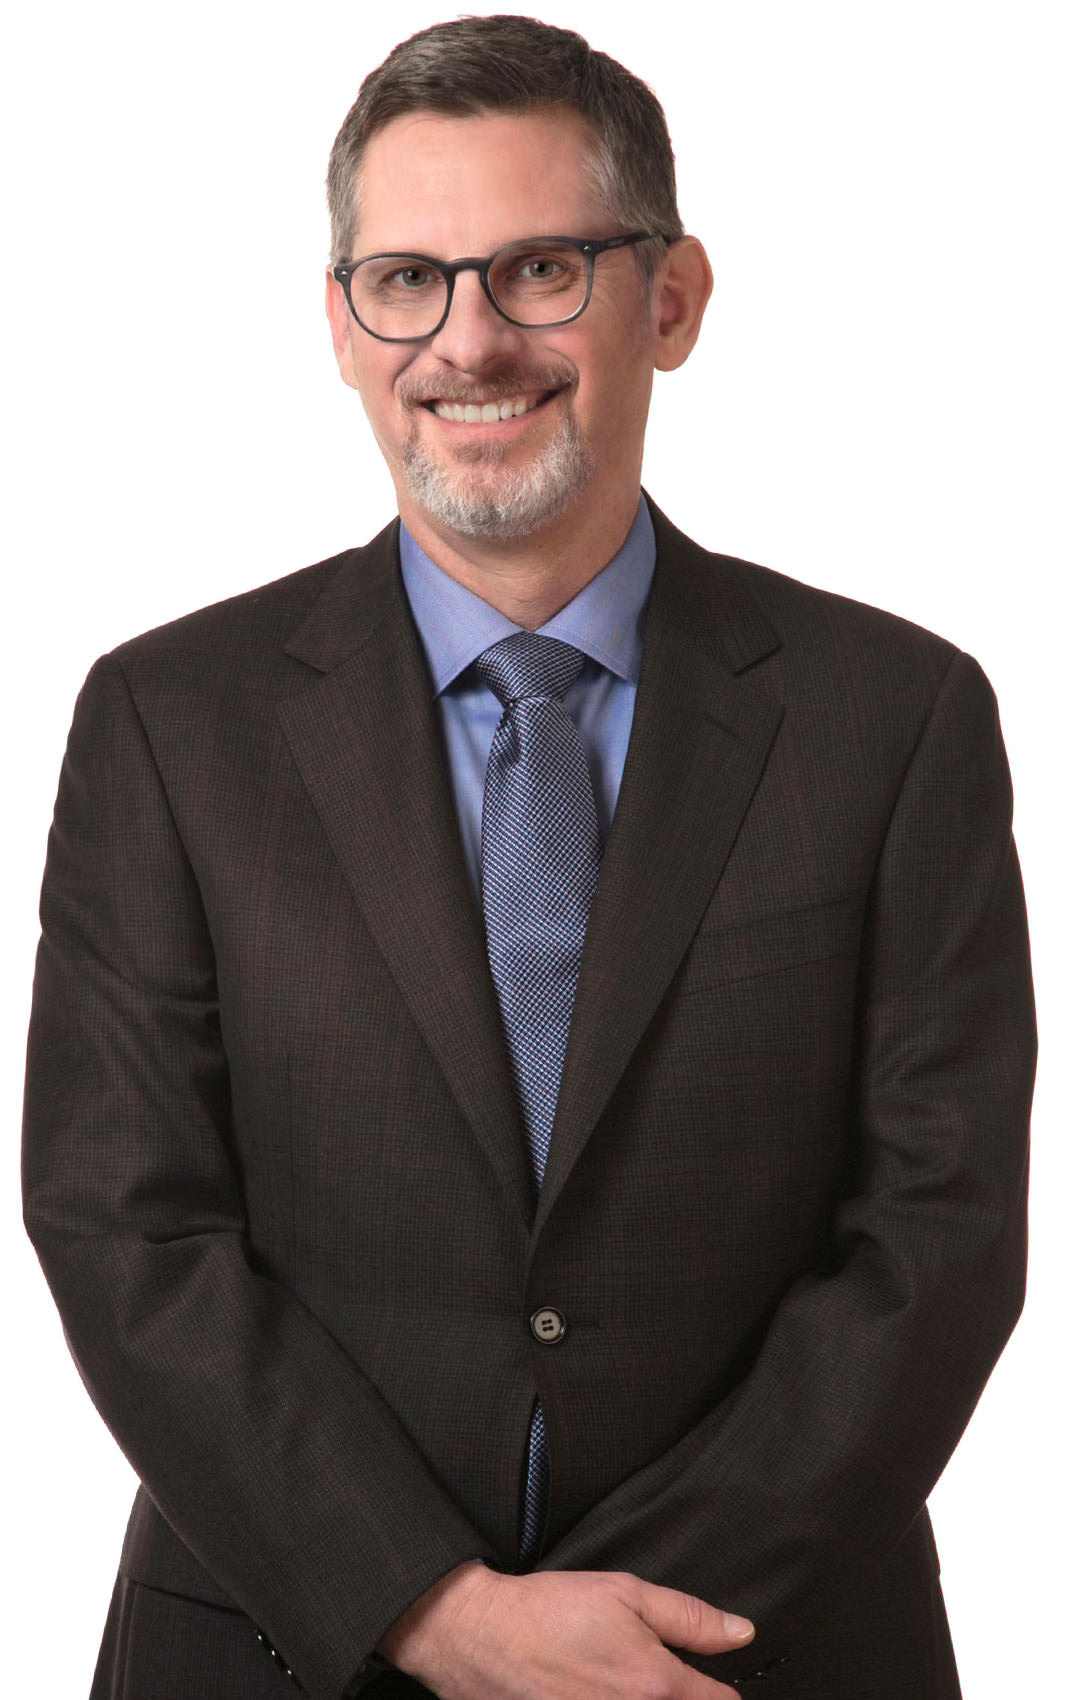 Roy Wyman